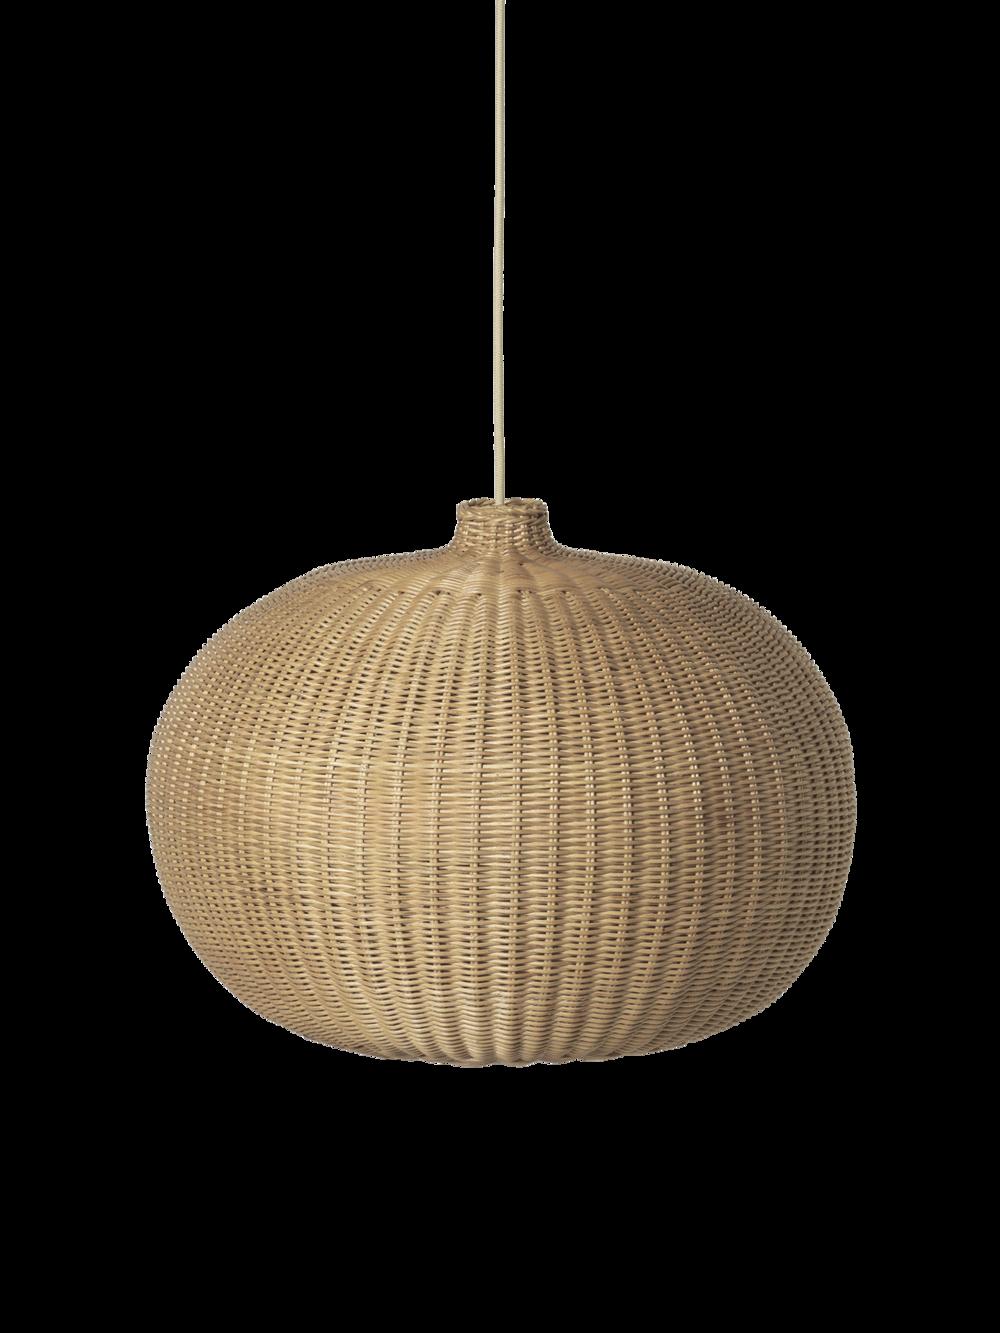 Braided Belly Lamp Shade Natural